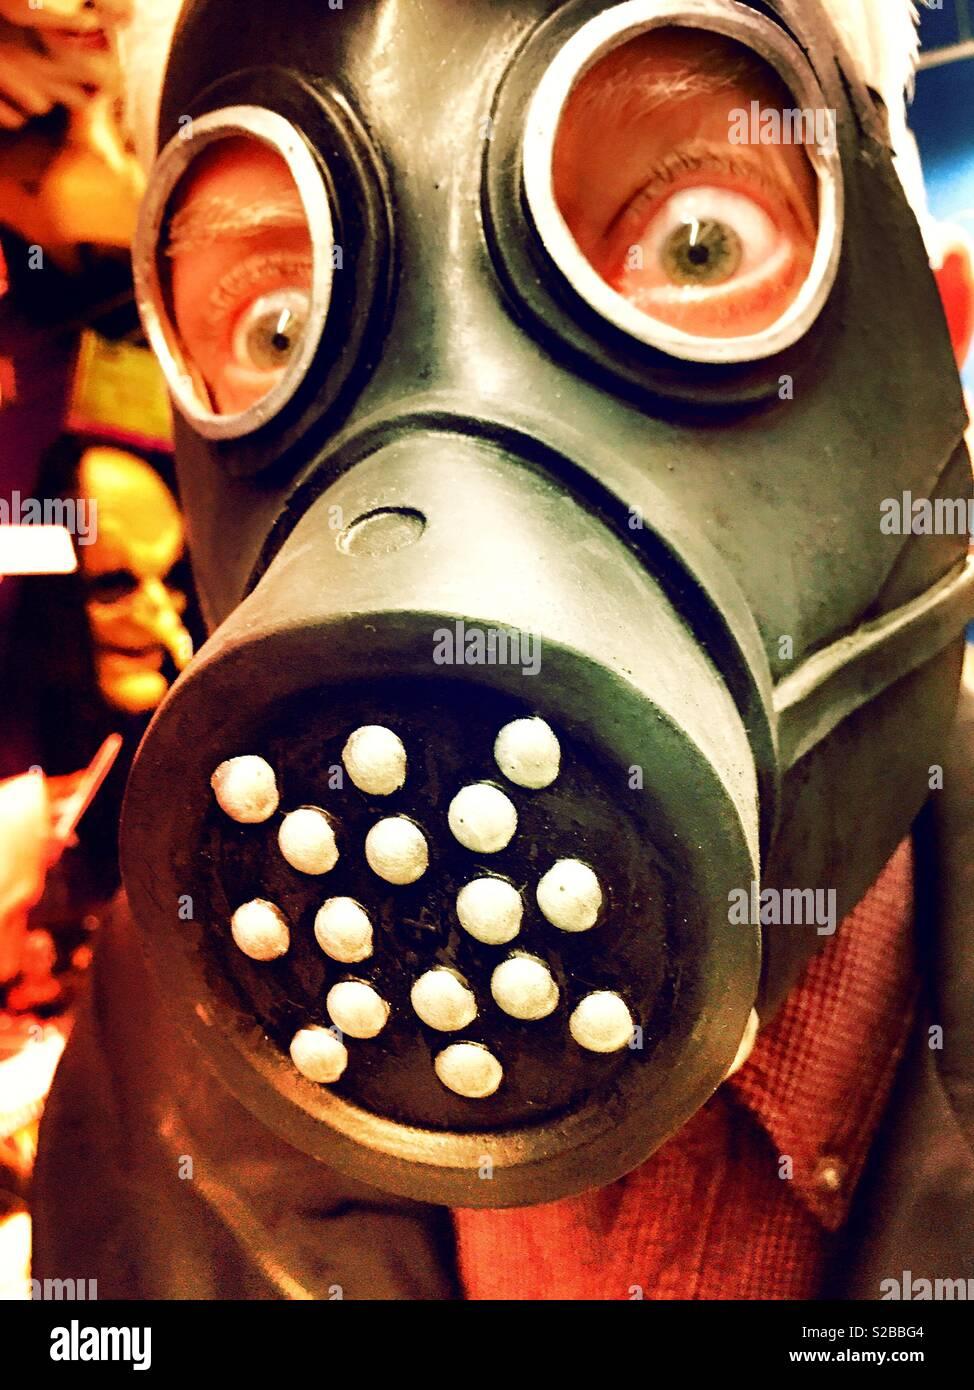 Creepy Gas Mask Stock Photos & Creepy Gas Mask Stock Images